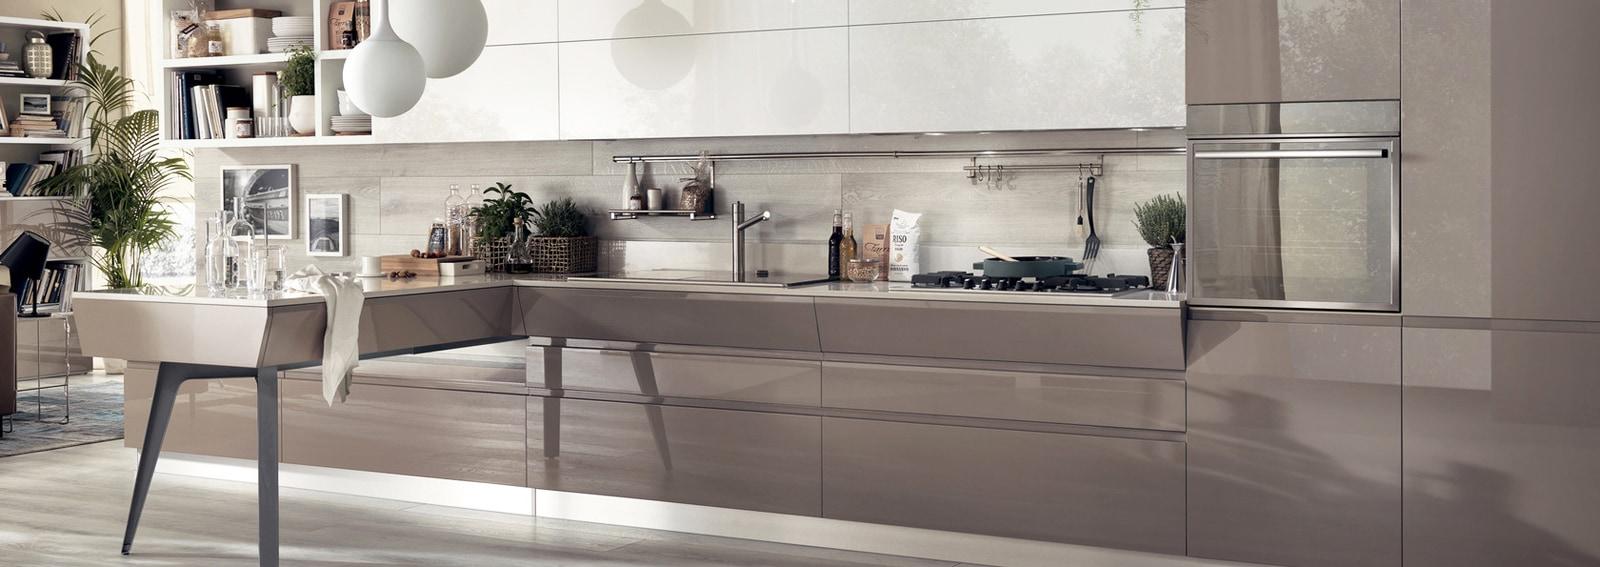 cover-cucina-penisola-desktop